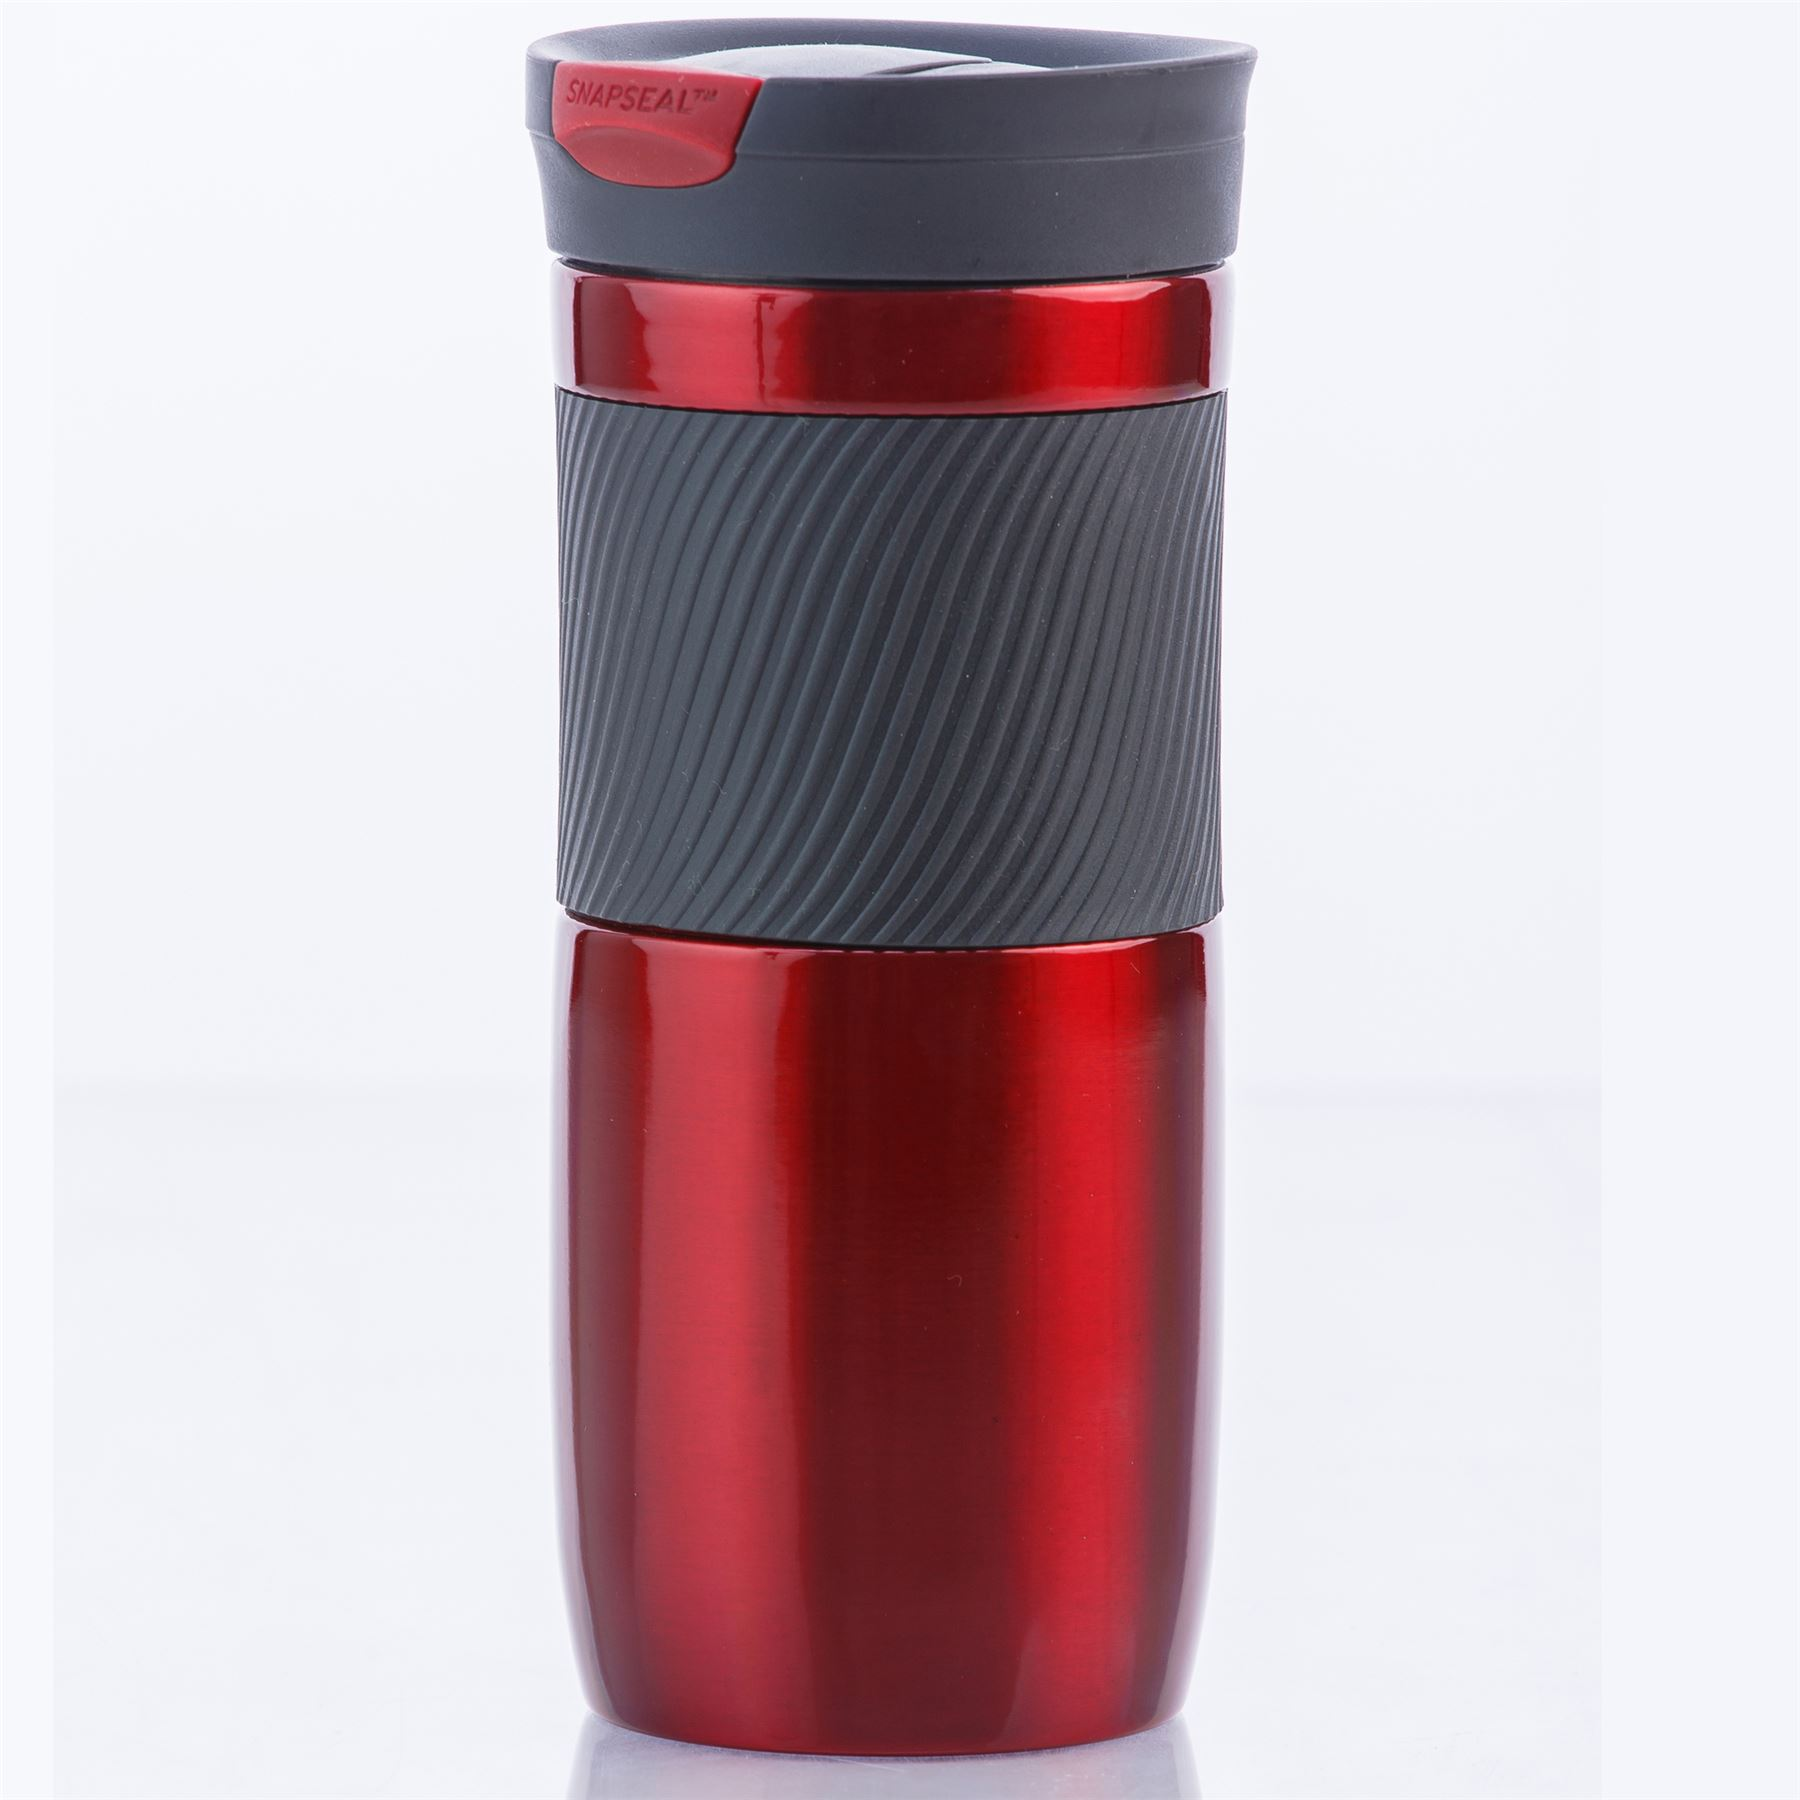 contigo byron travel mug snapseal vacuum insulated tumbler. Black Bedroom Furniture Sets. Home Design Ideas